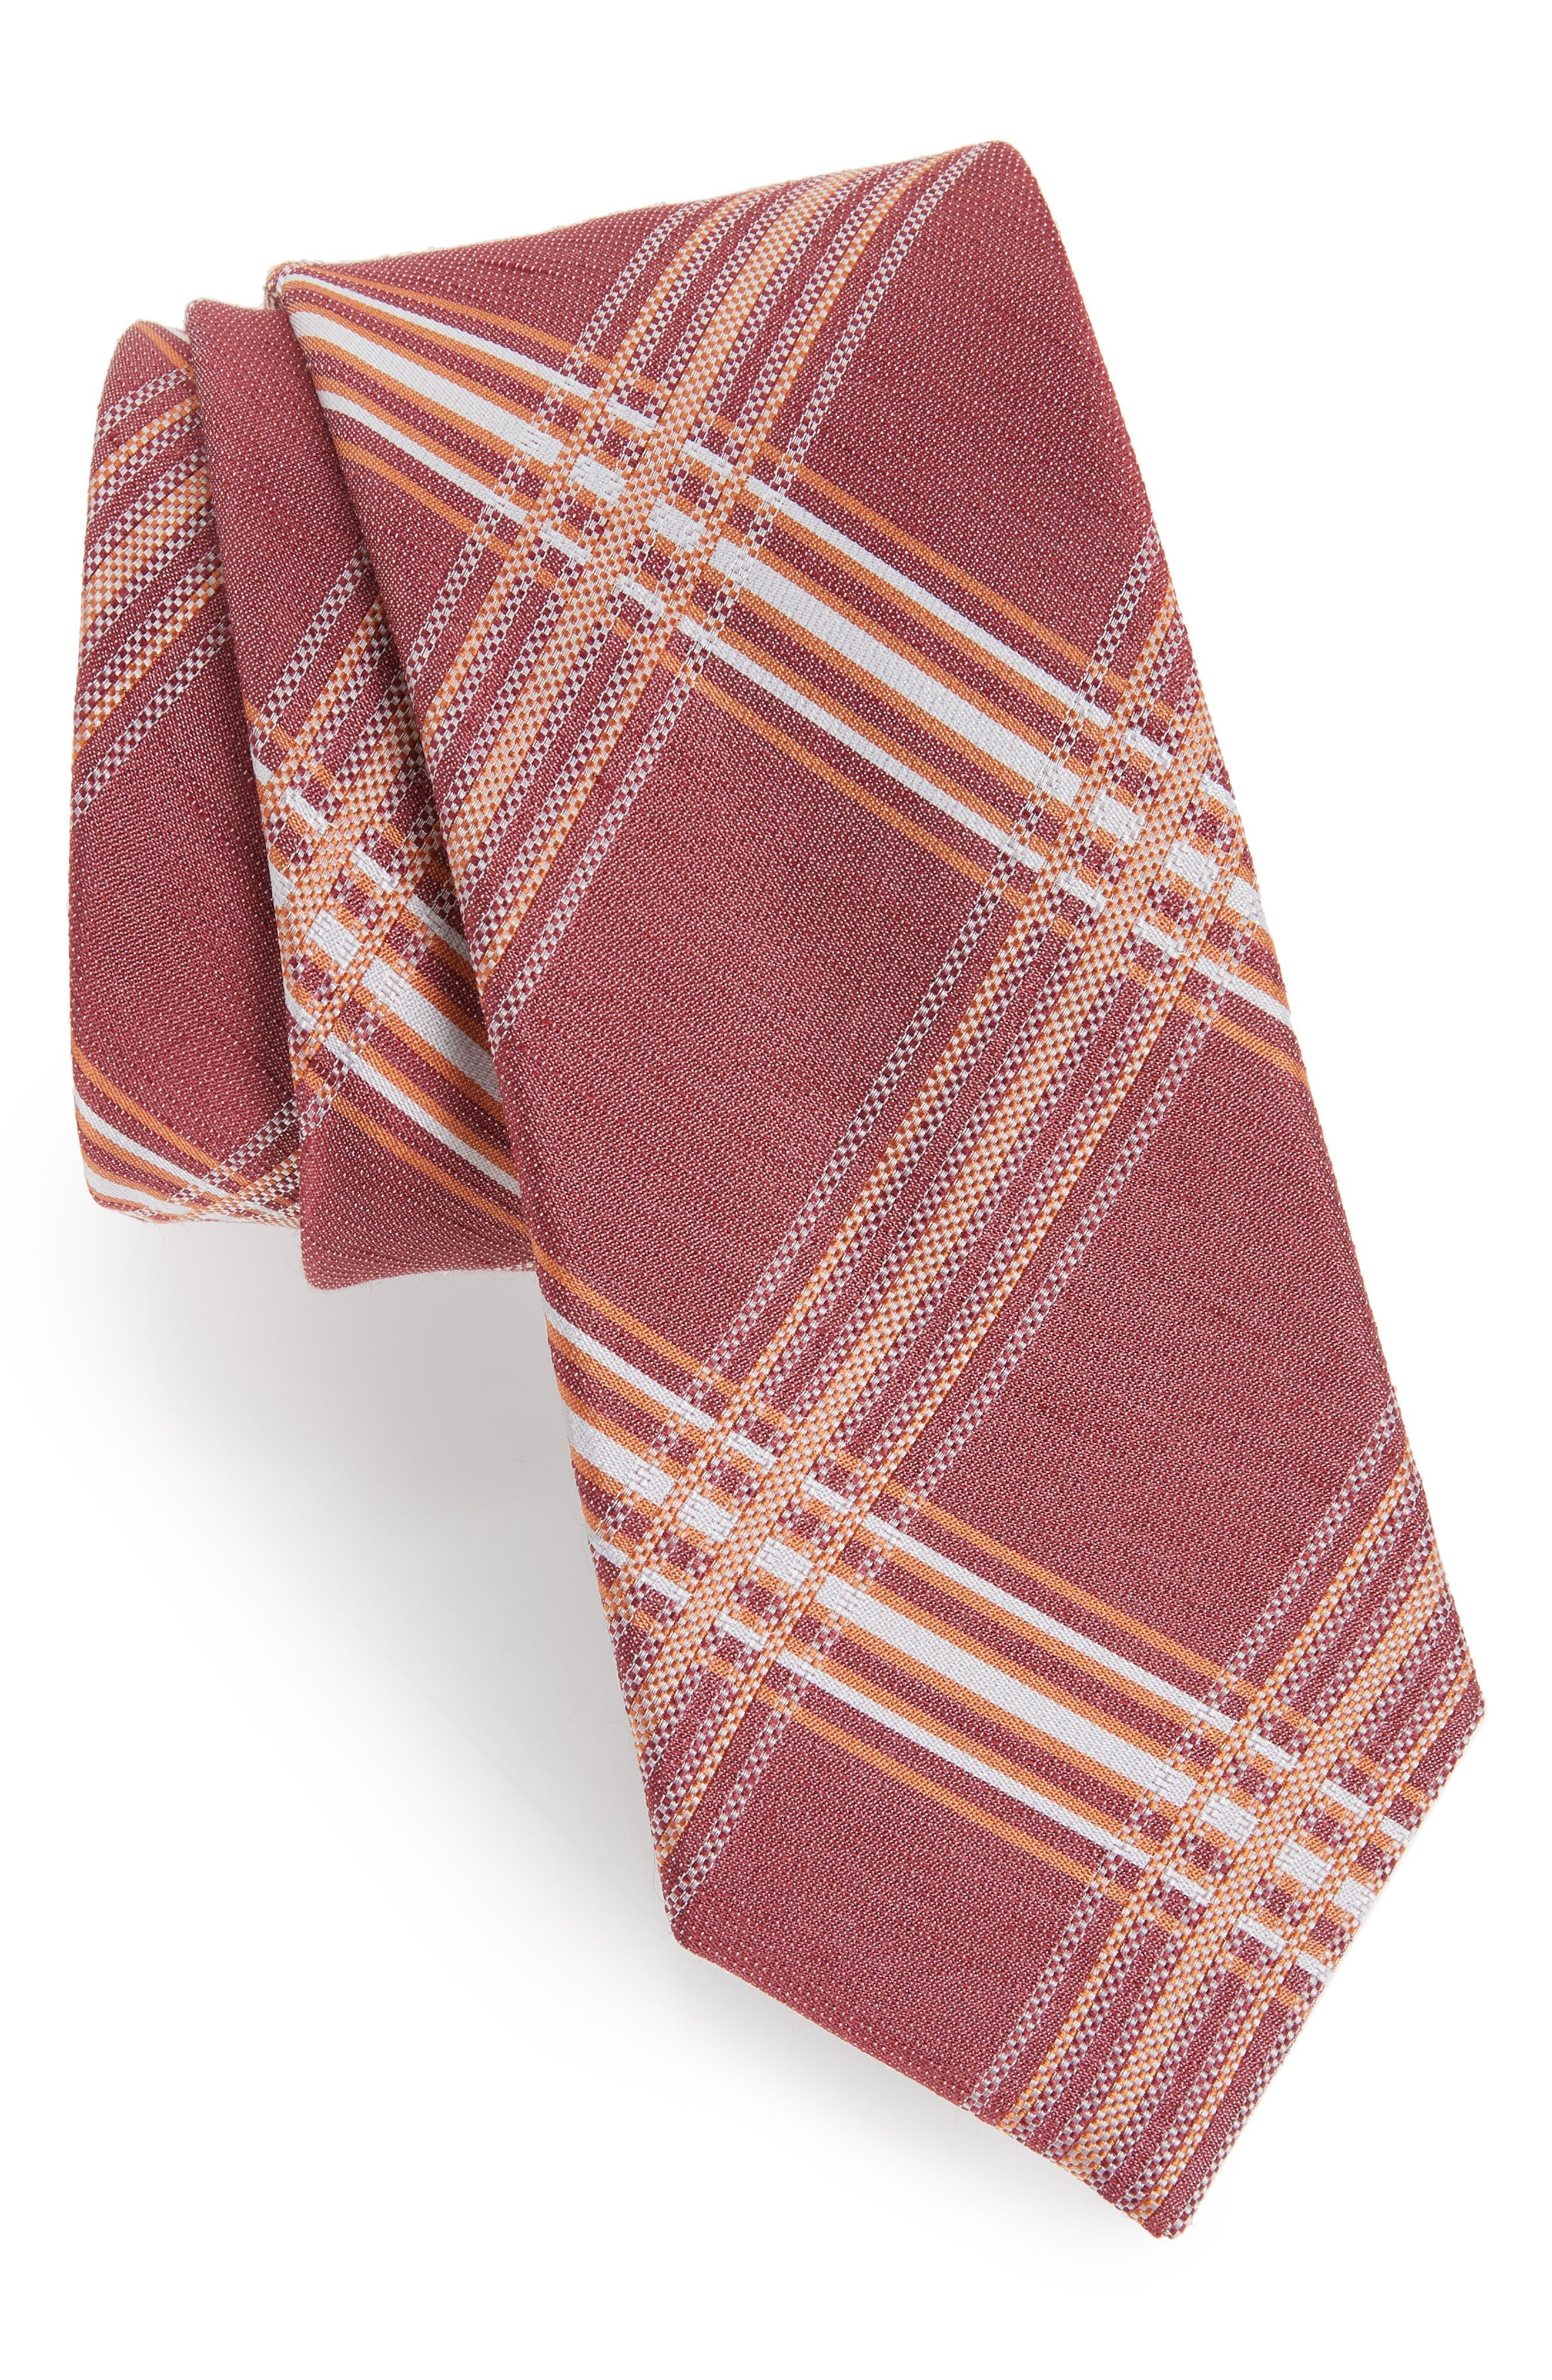 KP Plaid Silk & Linen Tie,                             Main thumbnail 1, color,                             MARSALA